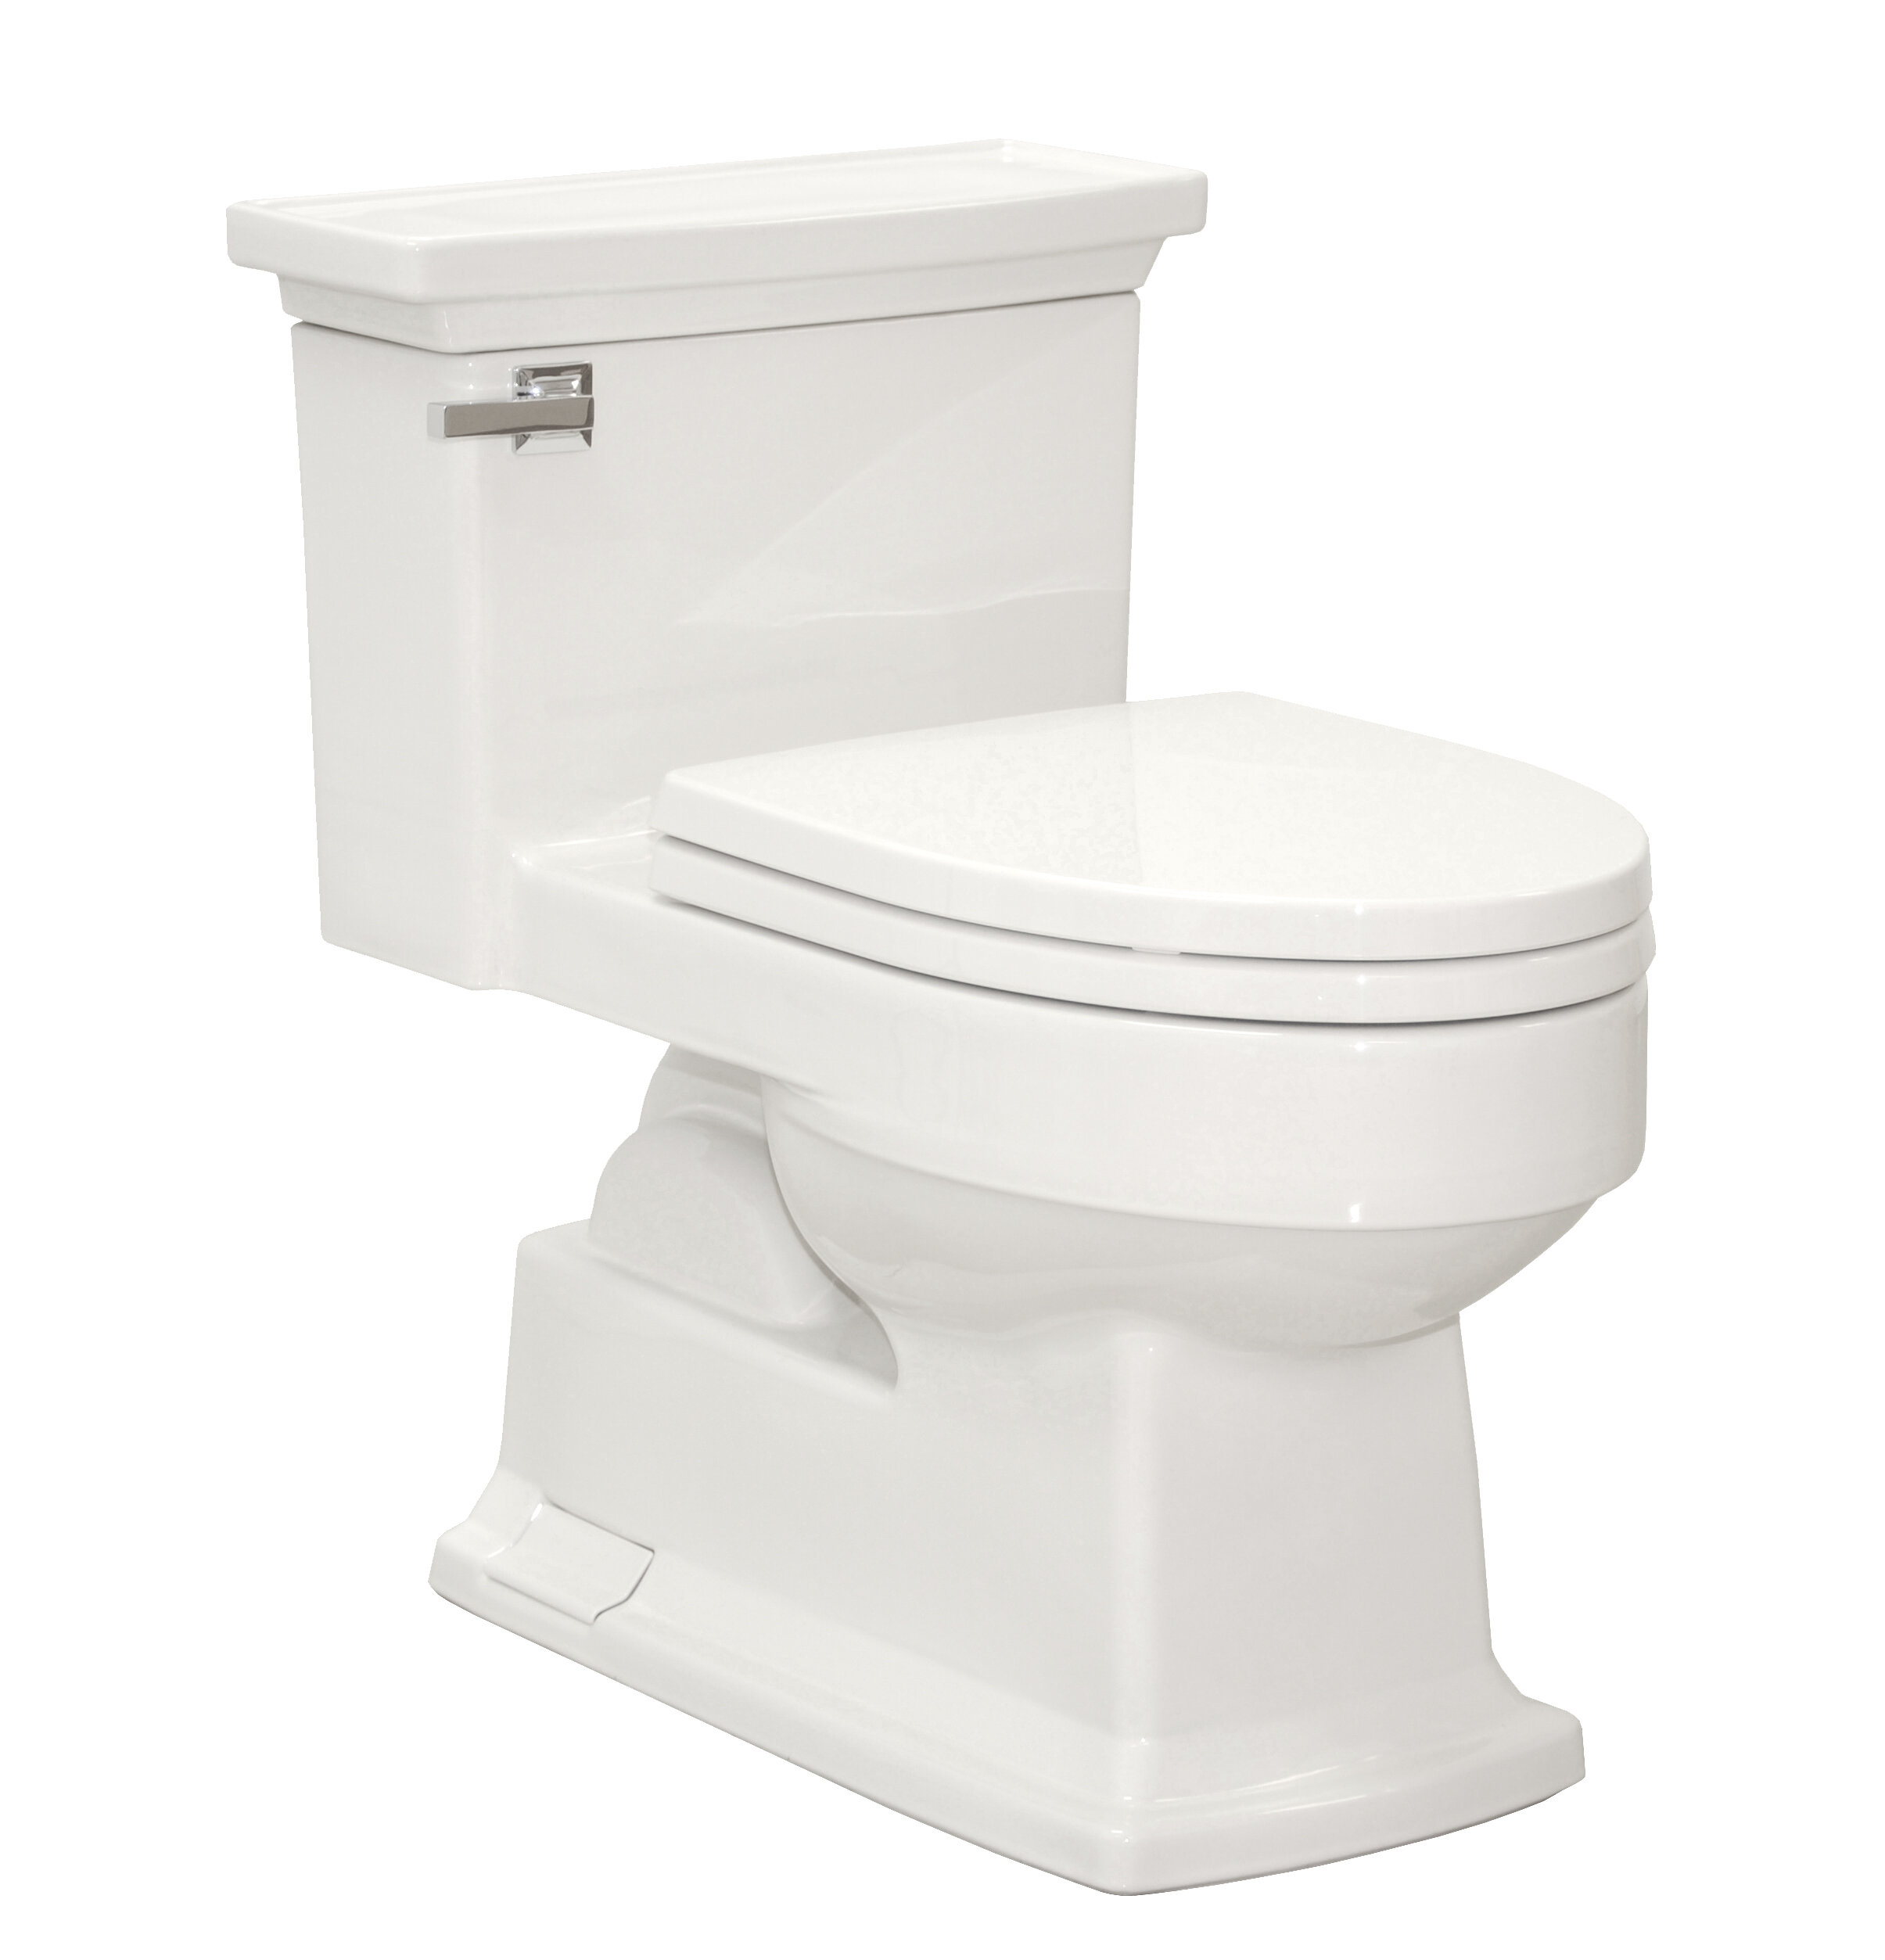 Toto Lloyd Eco 1.28 GPF Elongated One-Piece Toilet   Wayfair